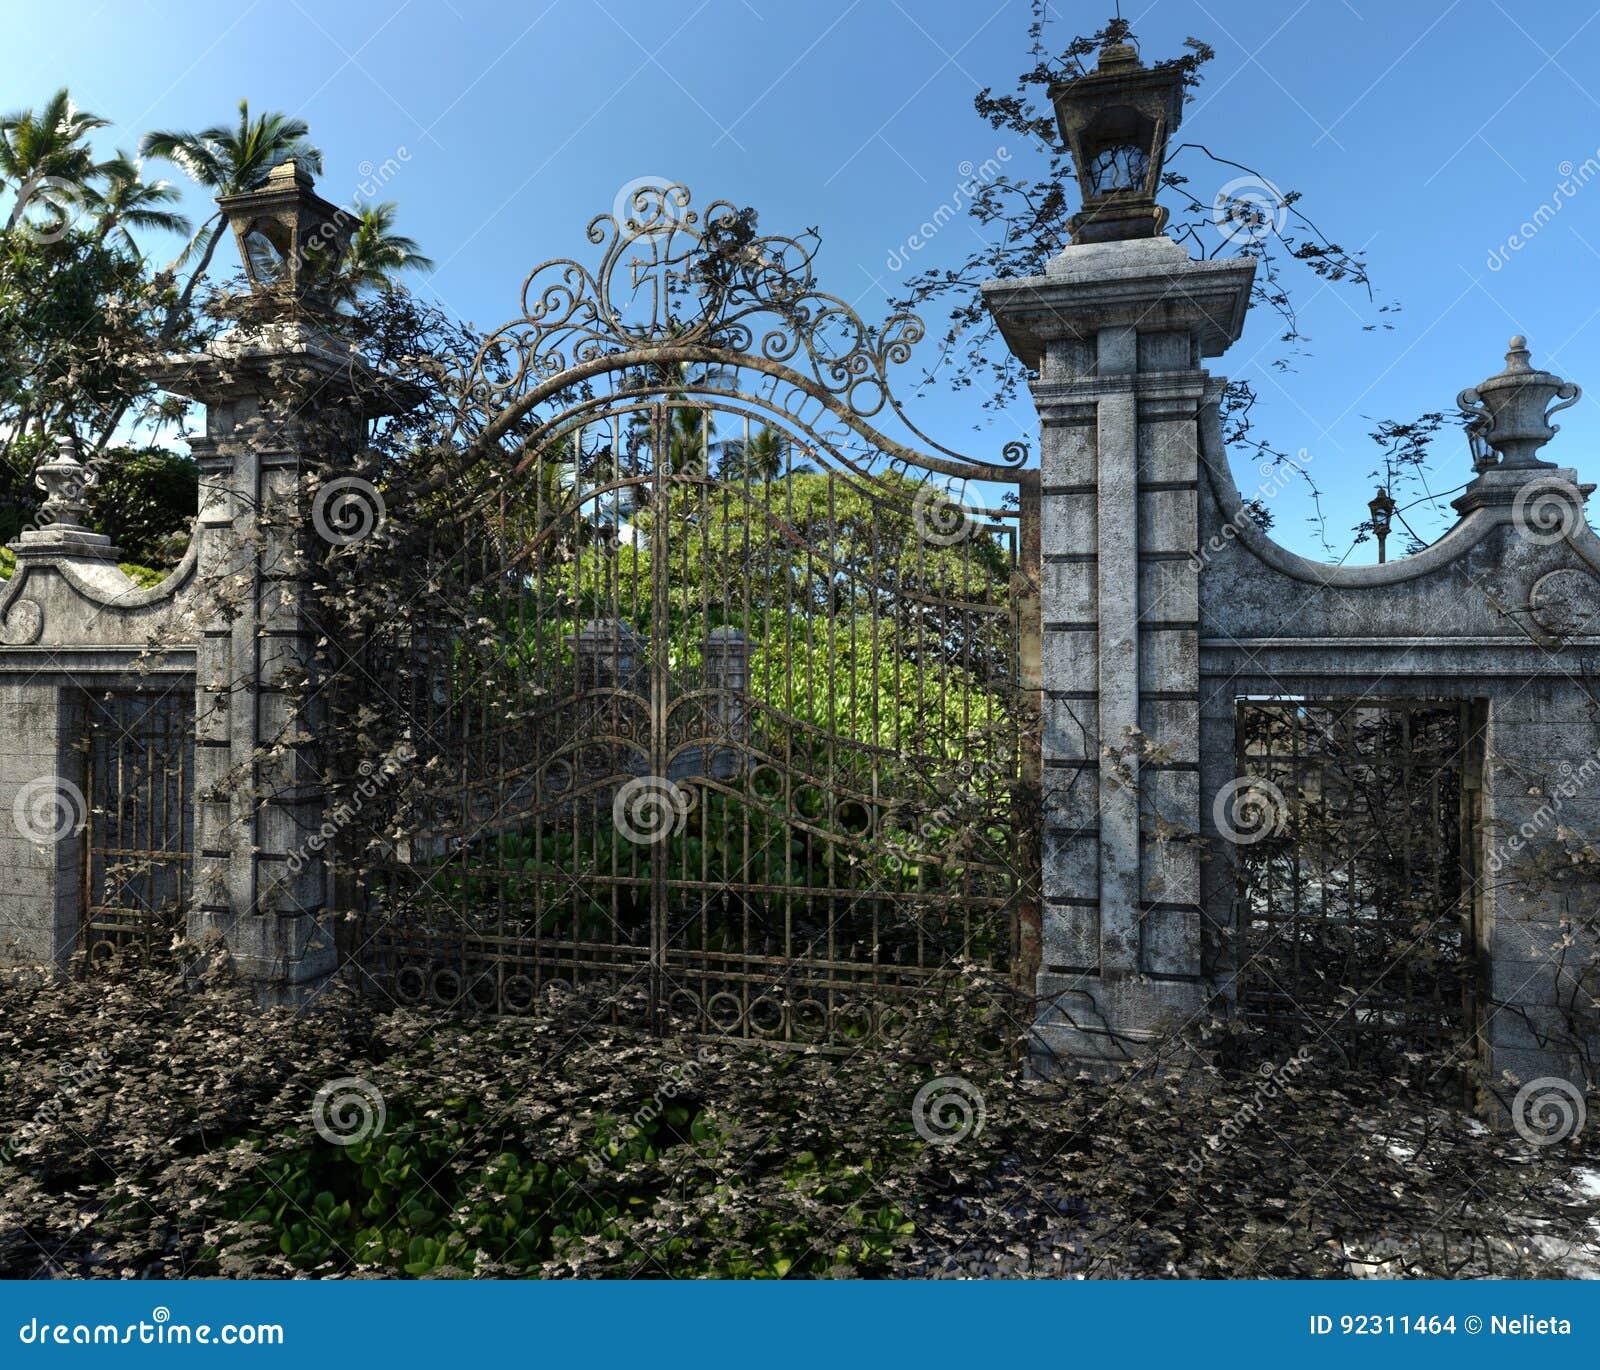 Graveyard Clipart Gate - Gate Clipart - Free Transparent PNG Clipart Images  Download